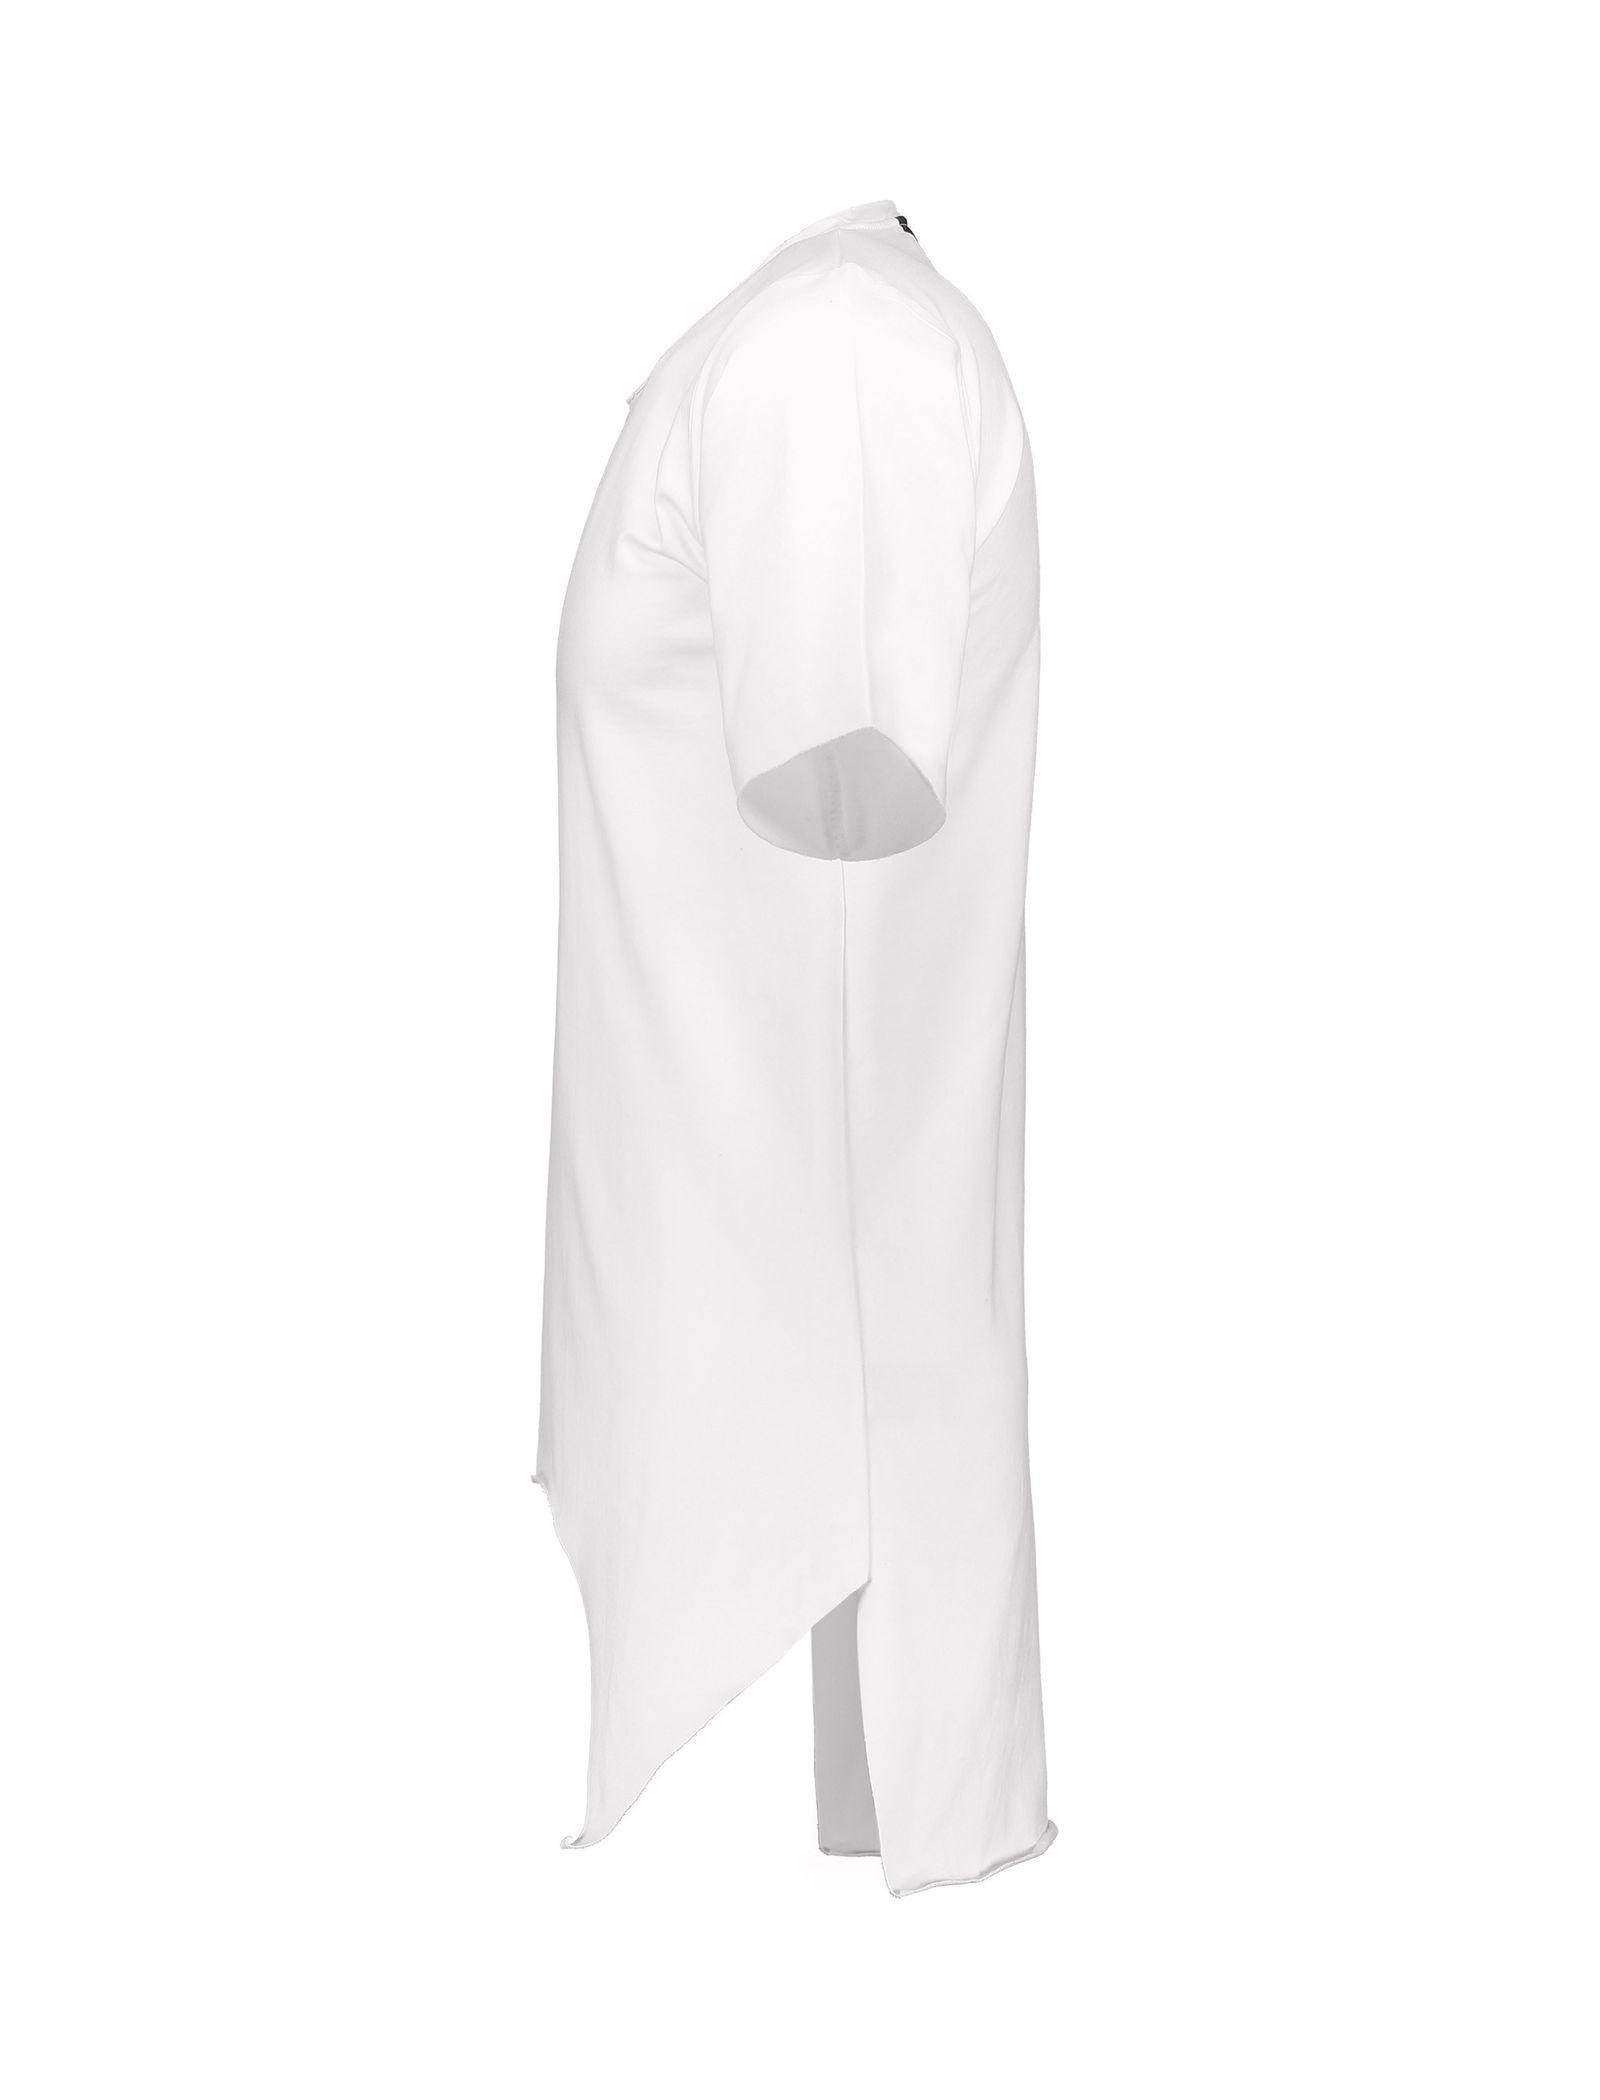 تی شرت ویسکوز یقه گرد مردانه Memory - یونیتی - سفيد - 3